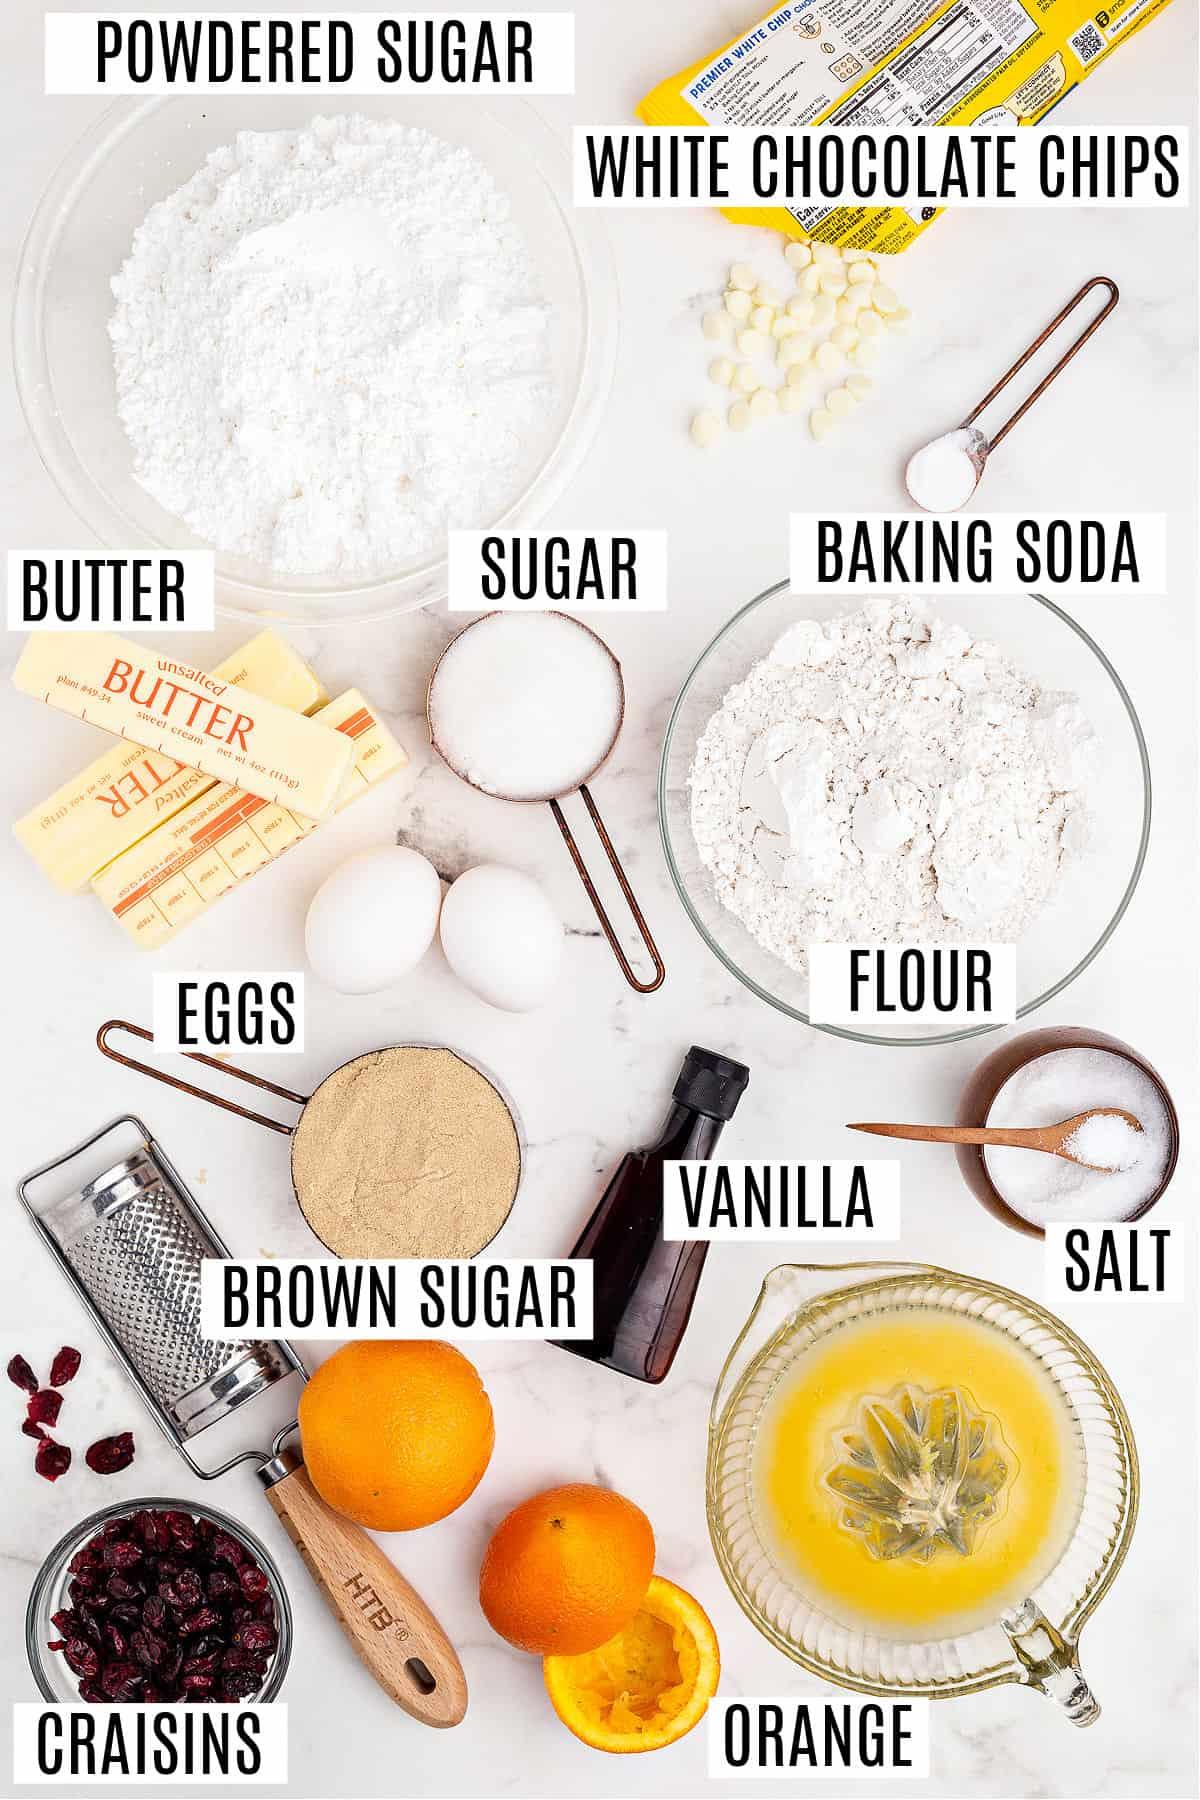 Ingredients needed for cranberry orange cookie bars.